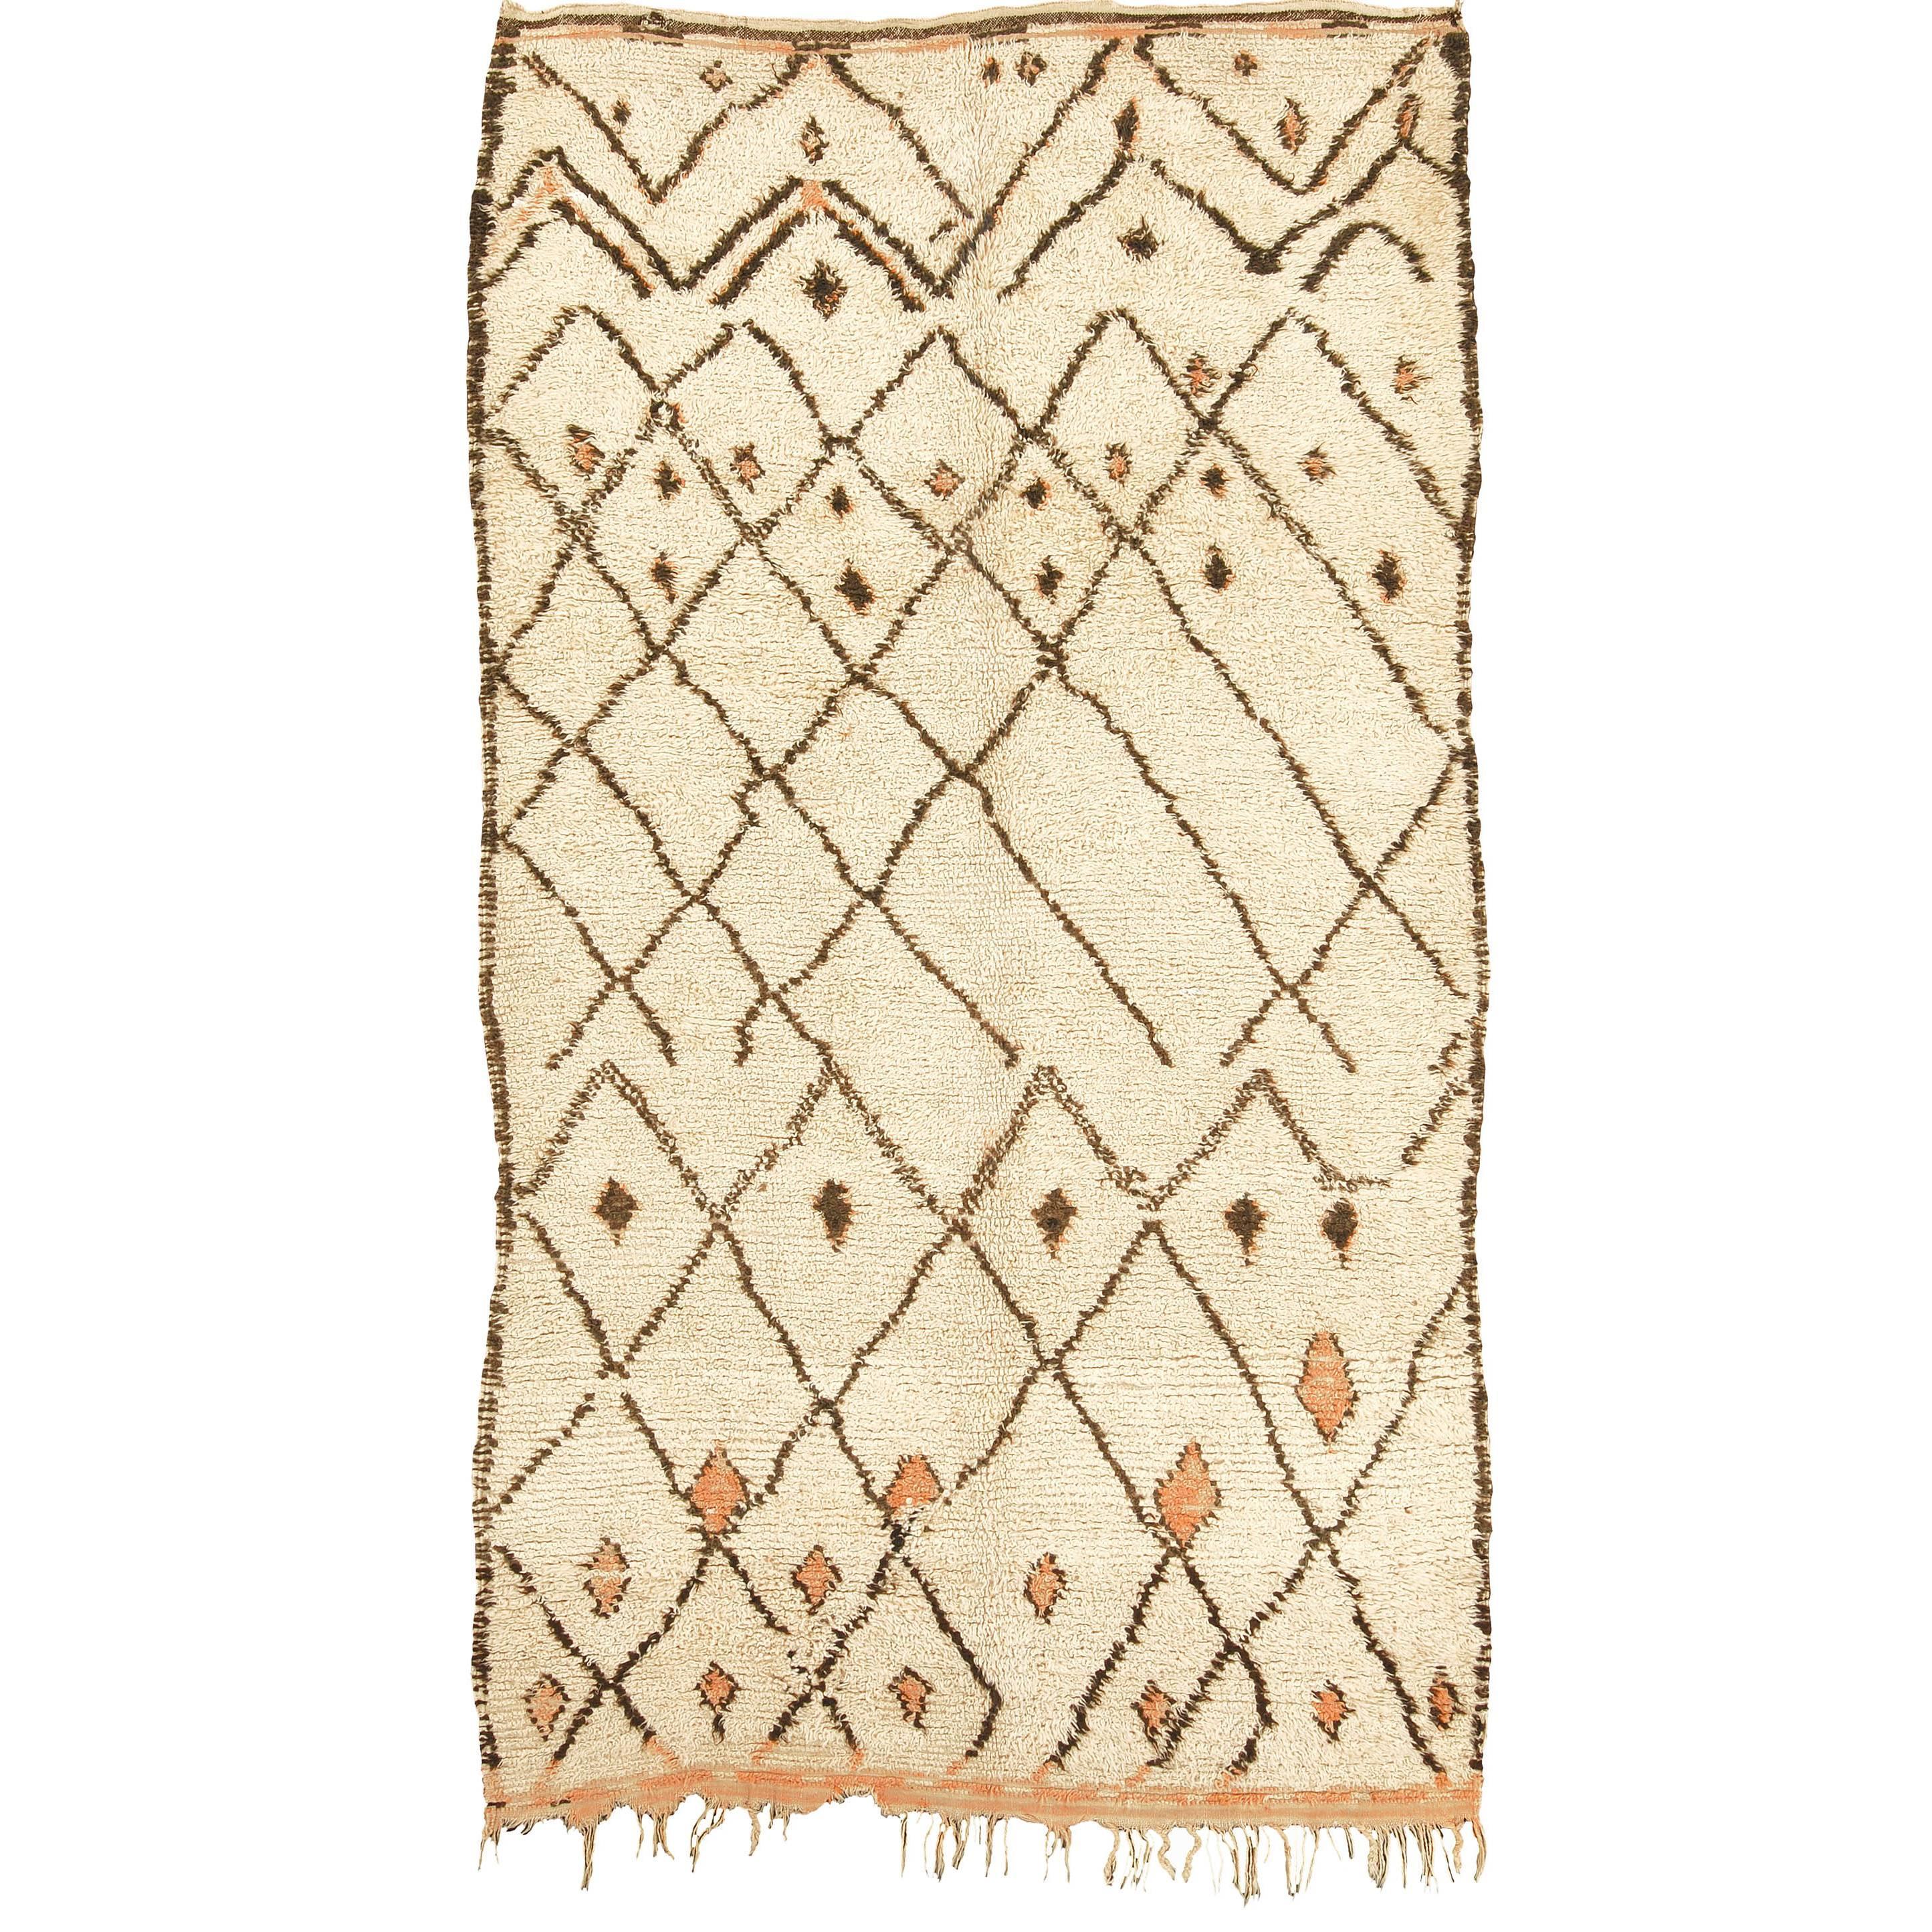 Mid-20th Century Beni Ouarain Carpet